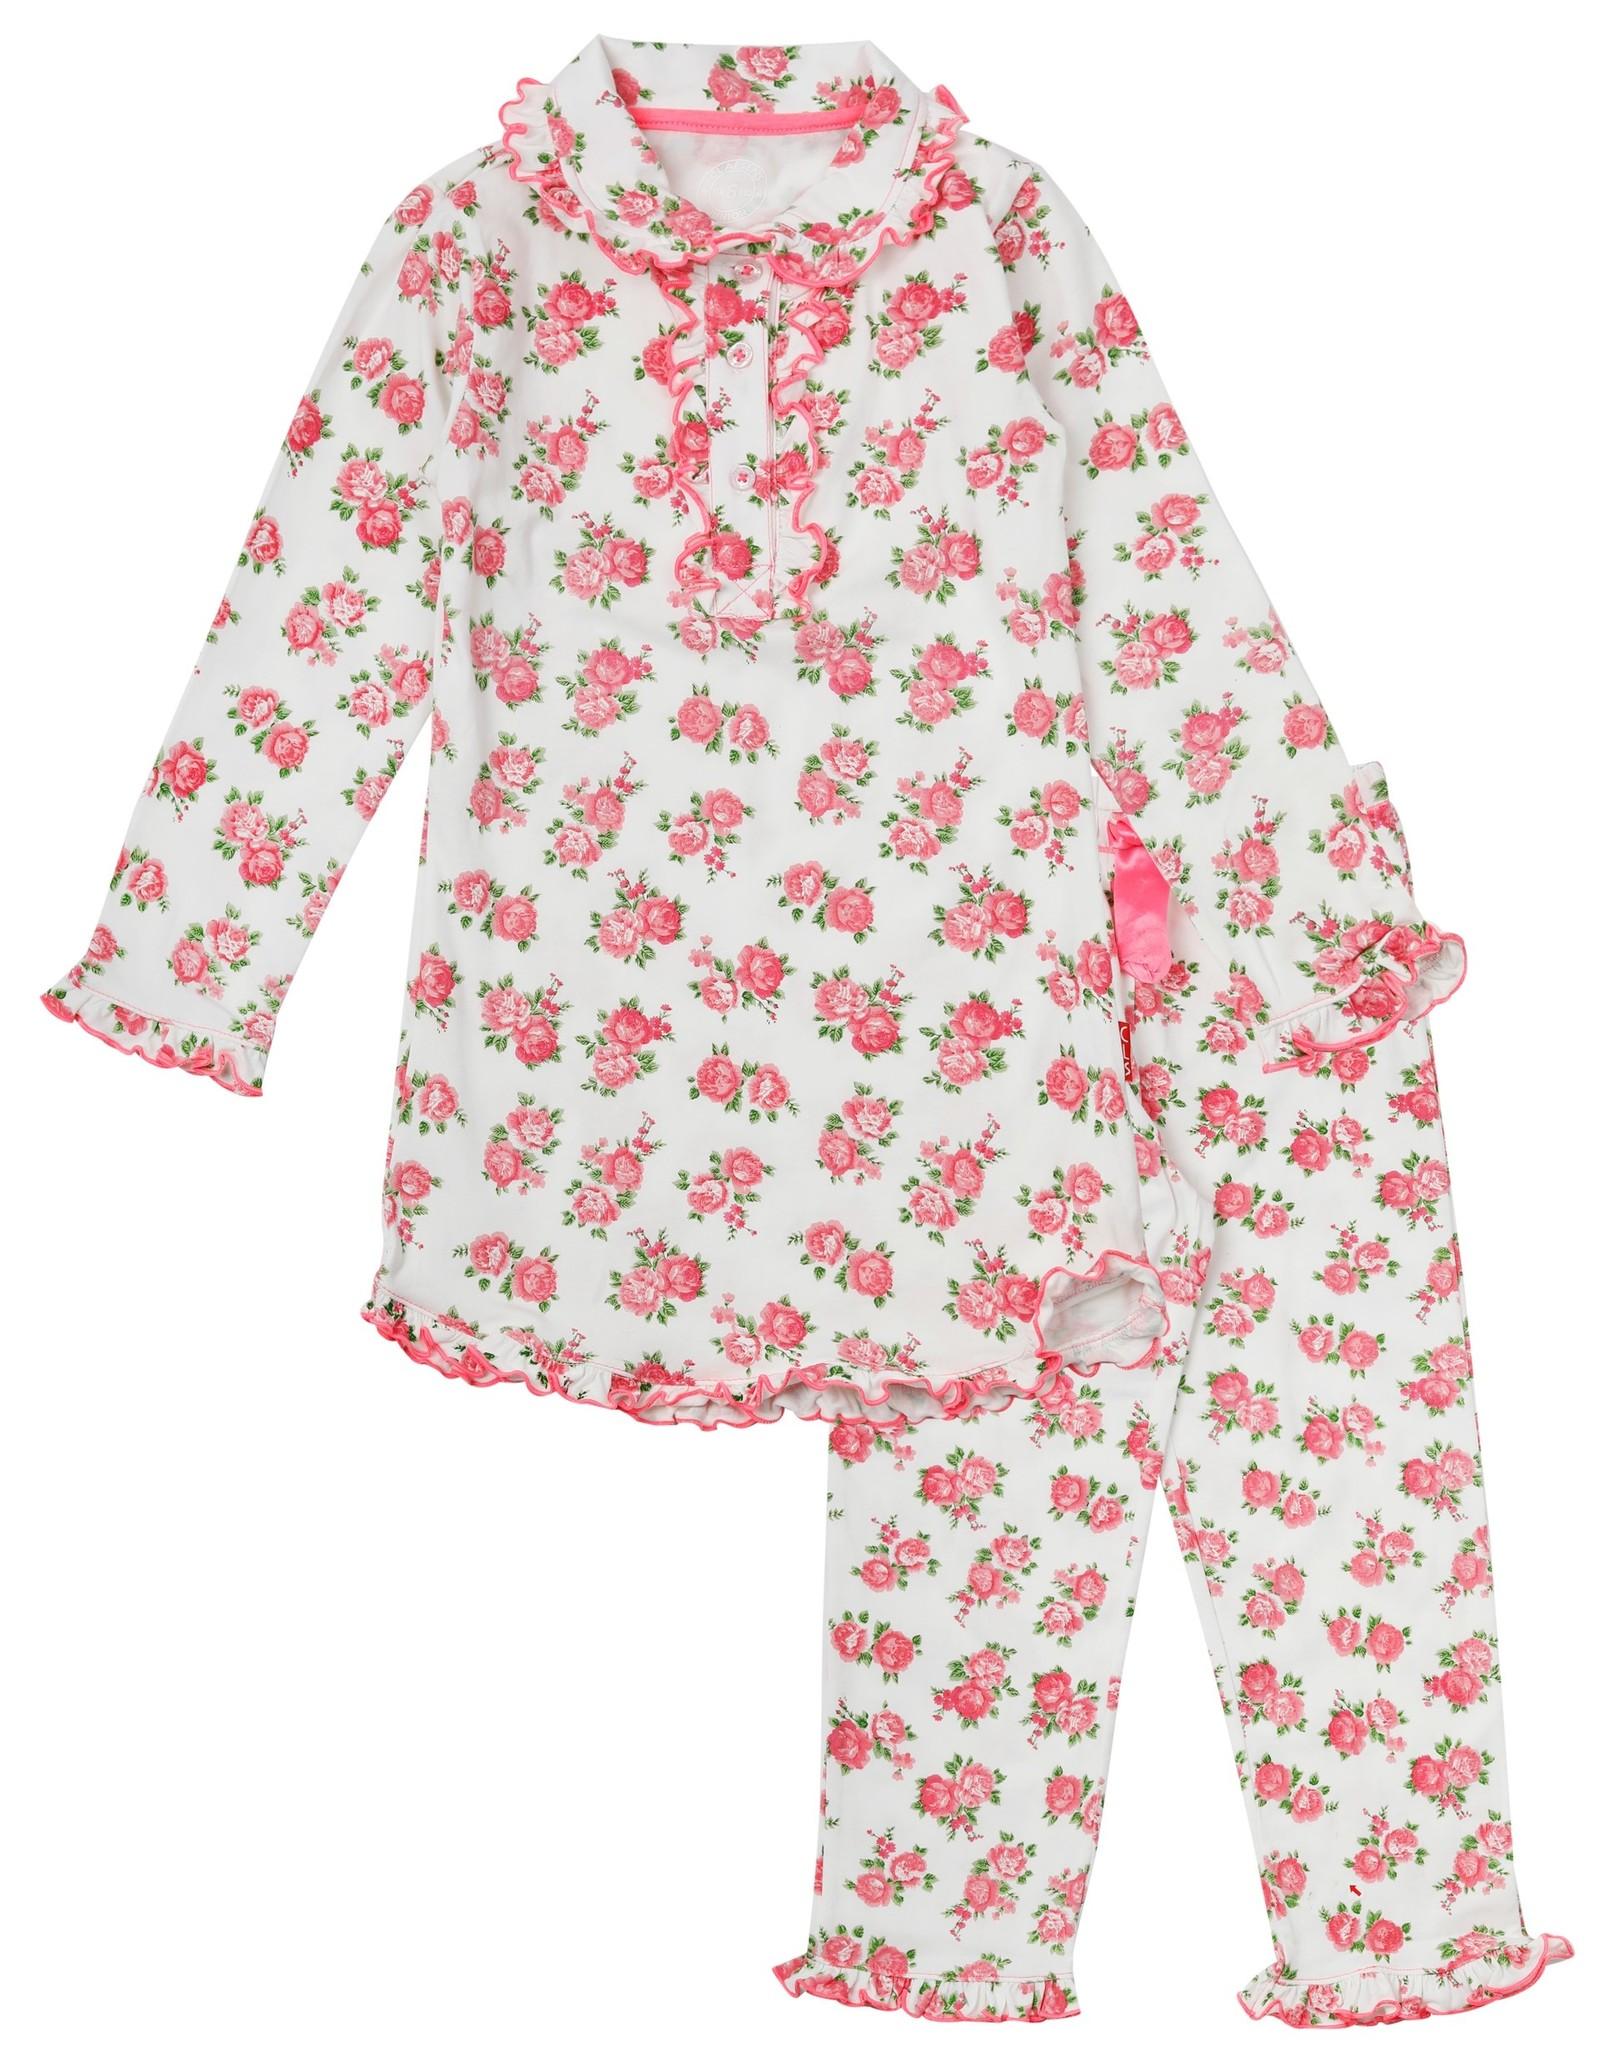 CLAESEN'S CLAESEN'S Girls pyjama romantic flower